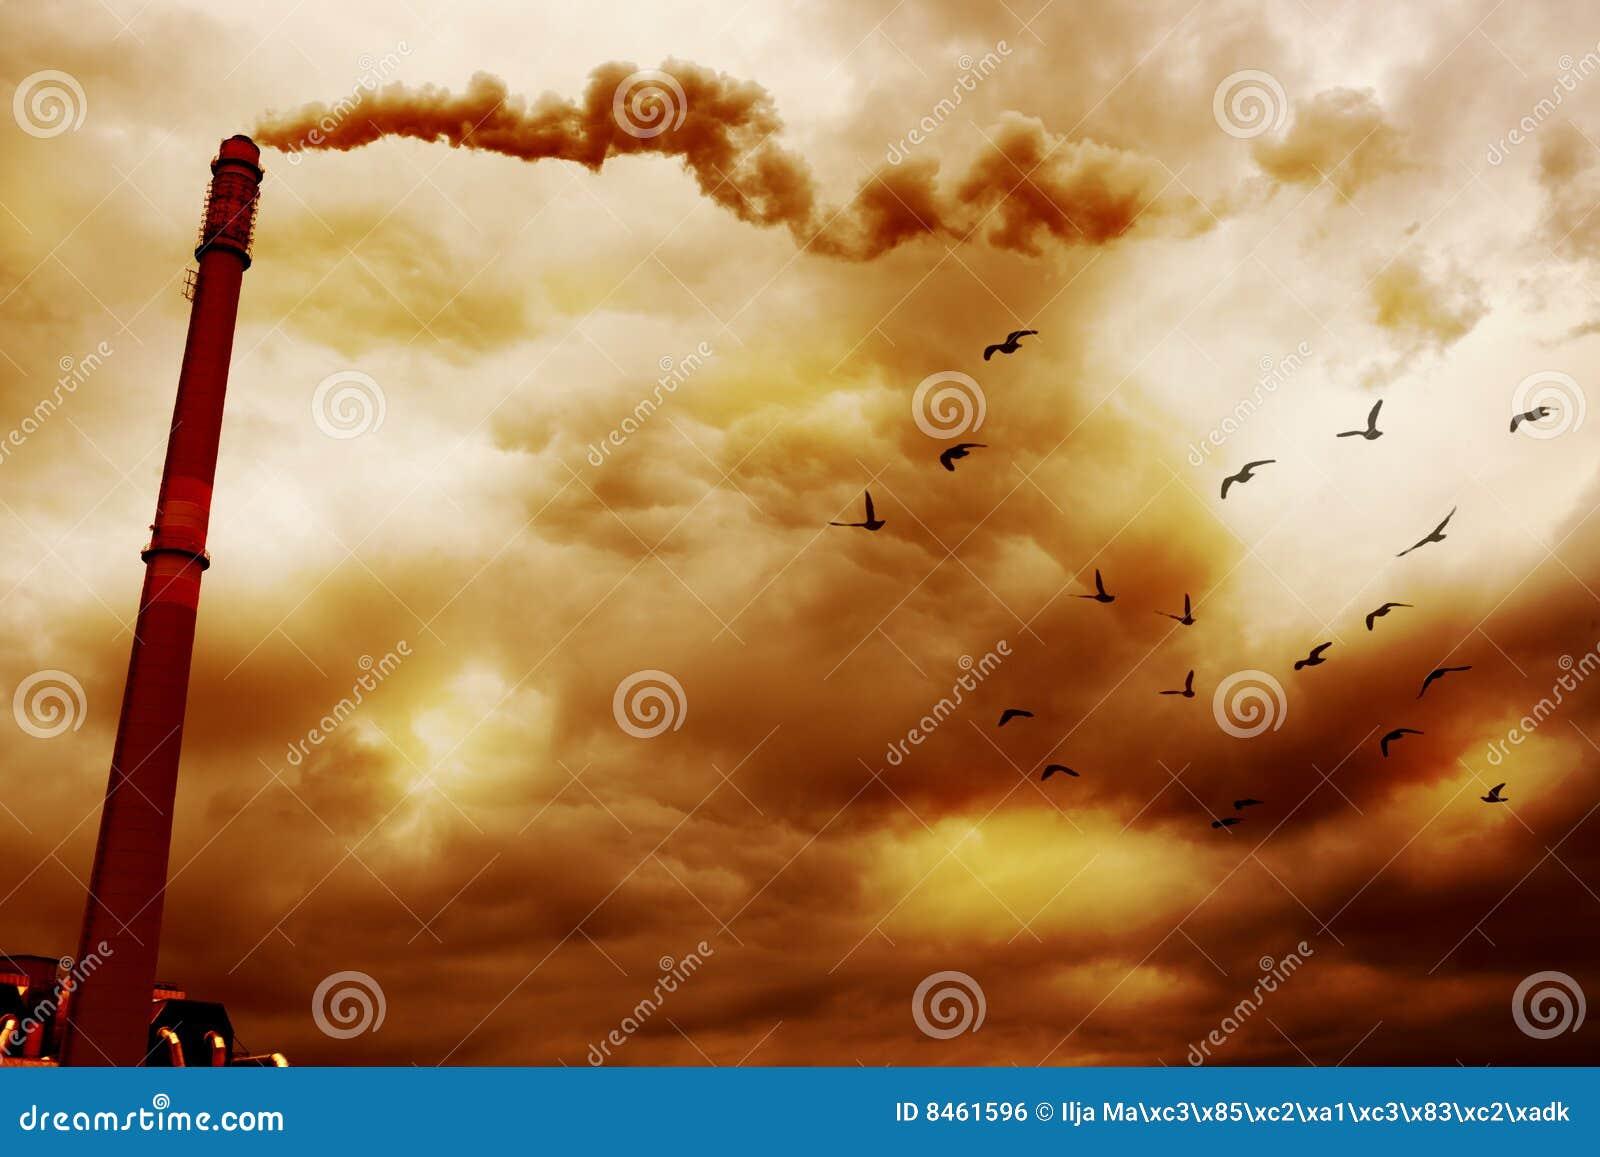 Föroreningrök